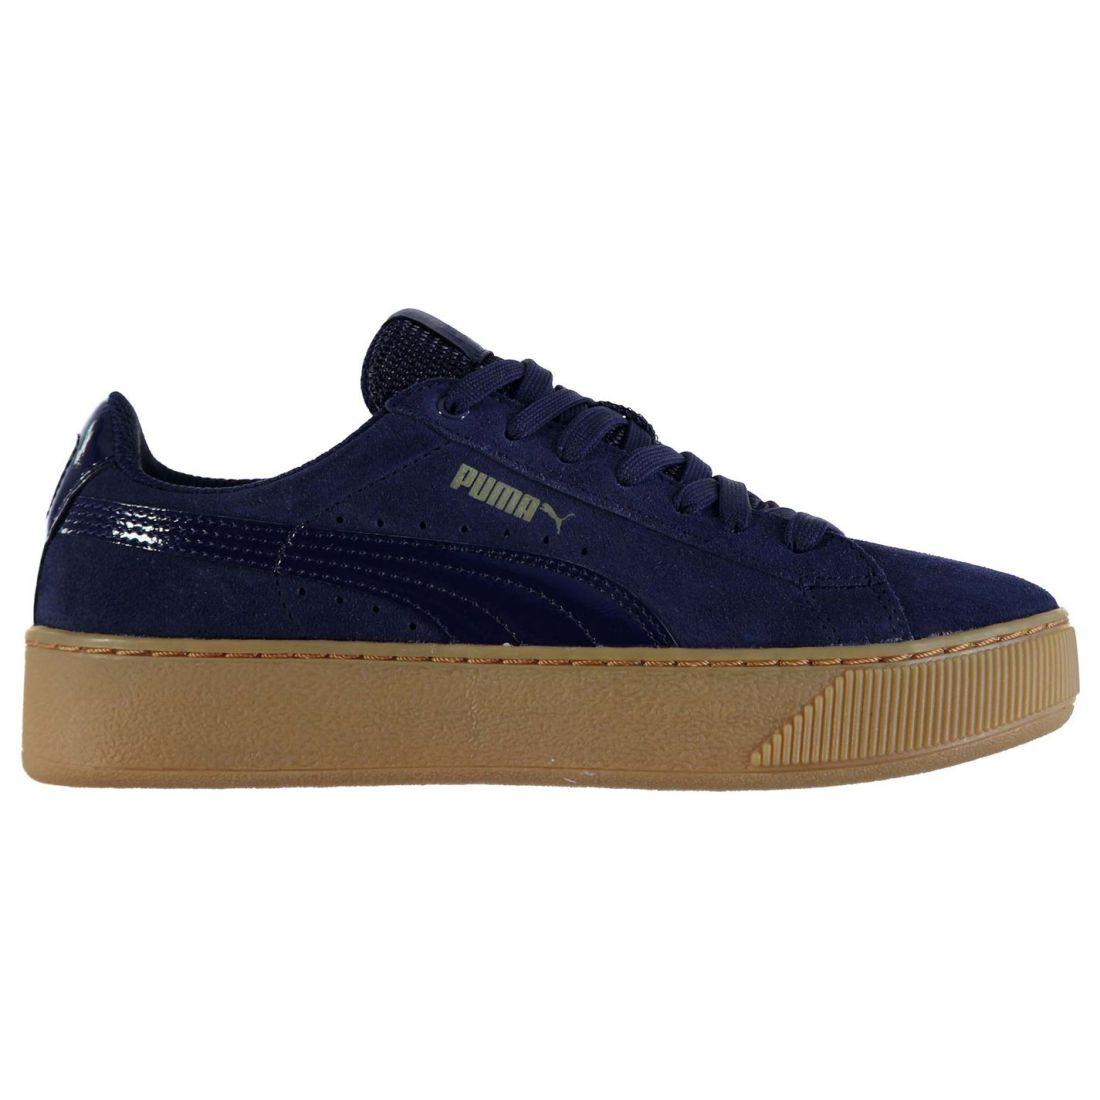 b58c9efd86c Puma Ladies Vikky Platform Trainers Laces Fastened Shoes Footwear